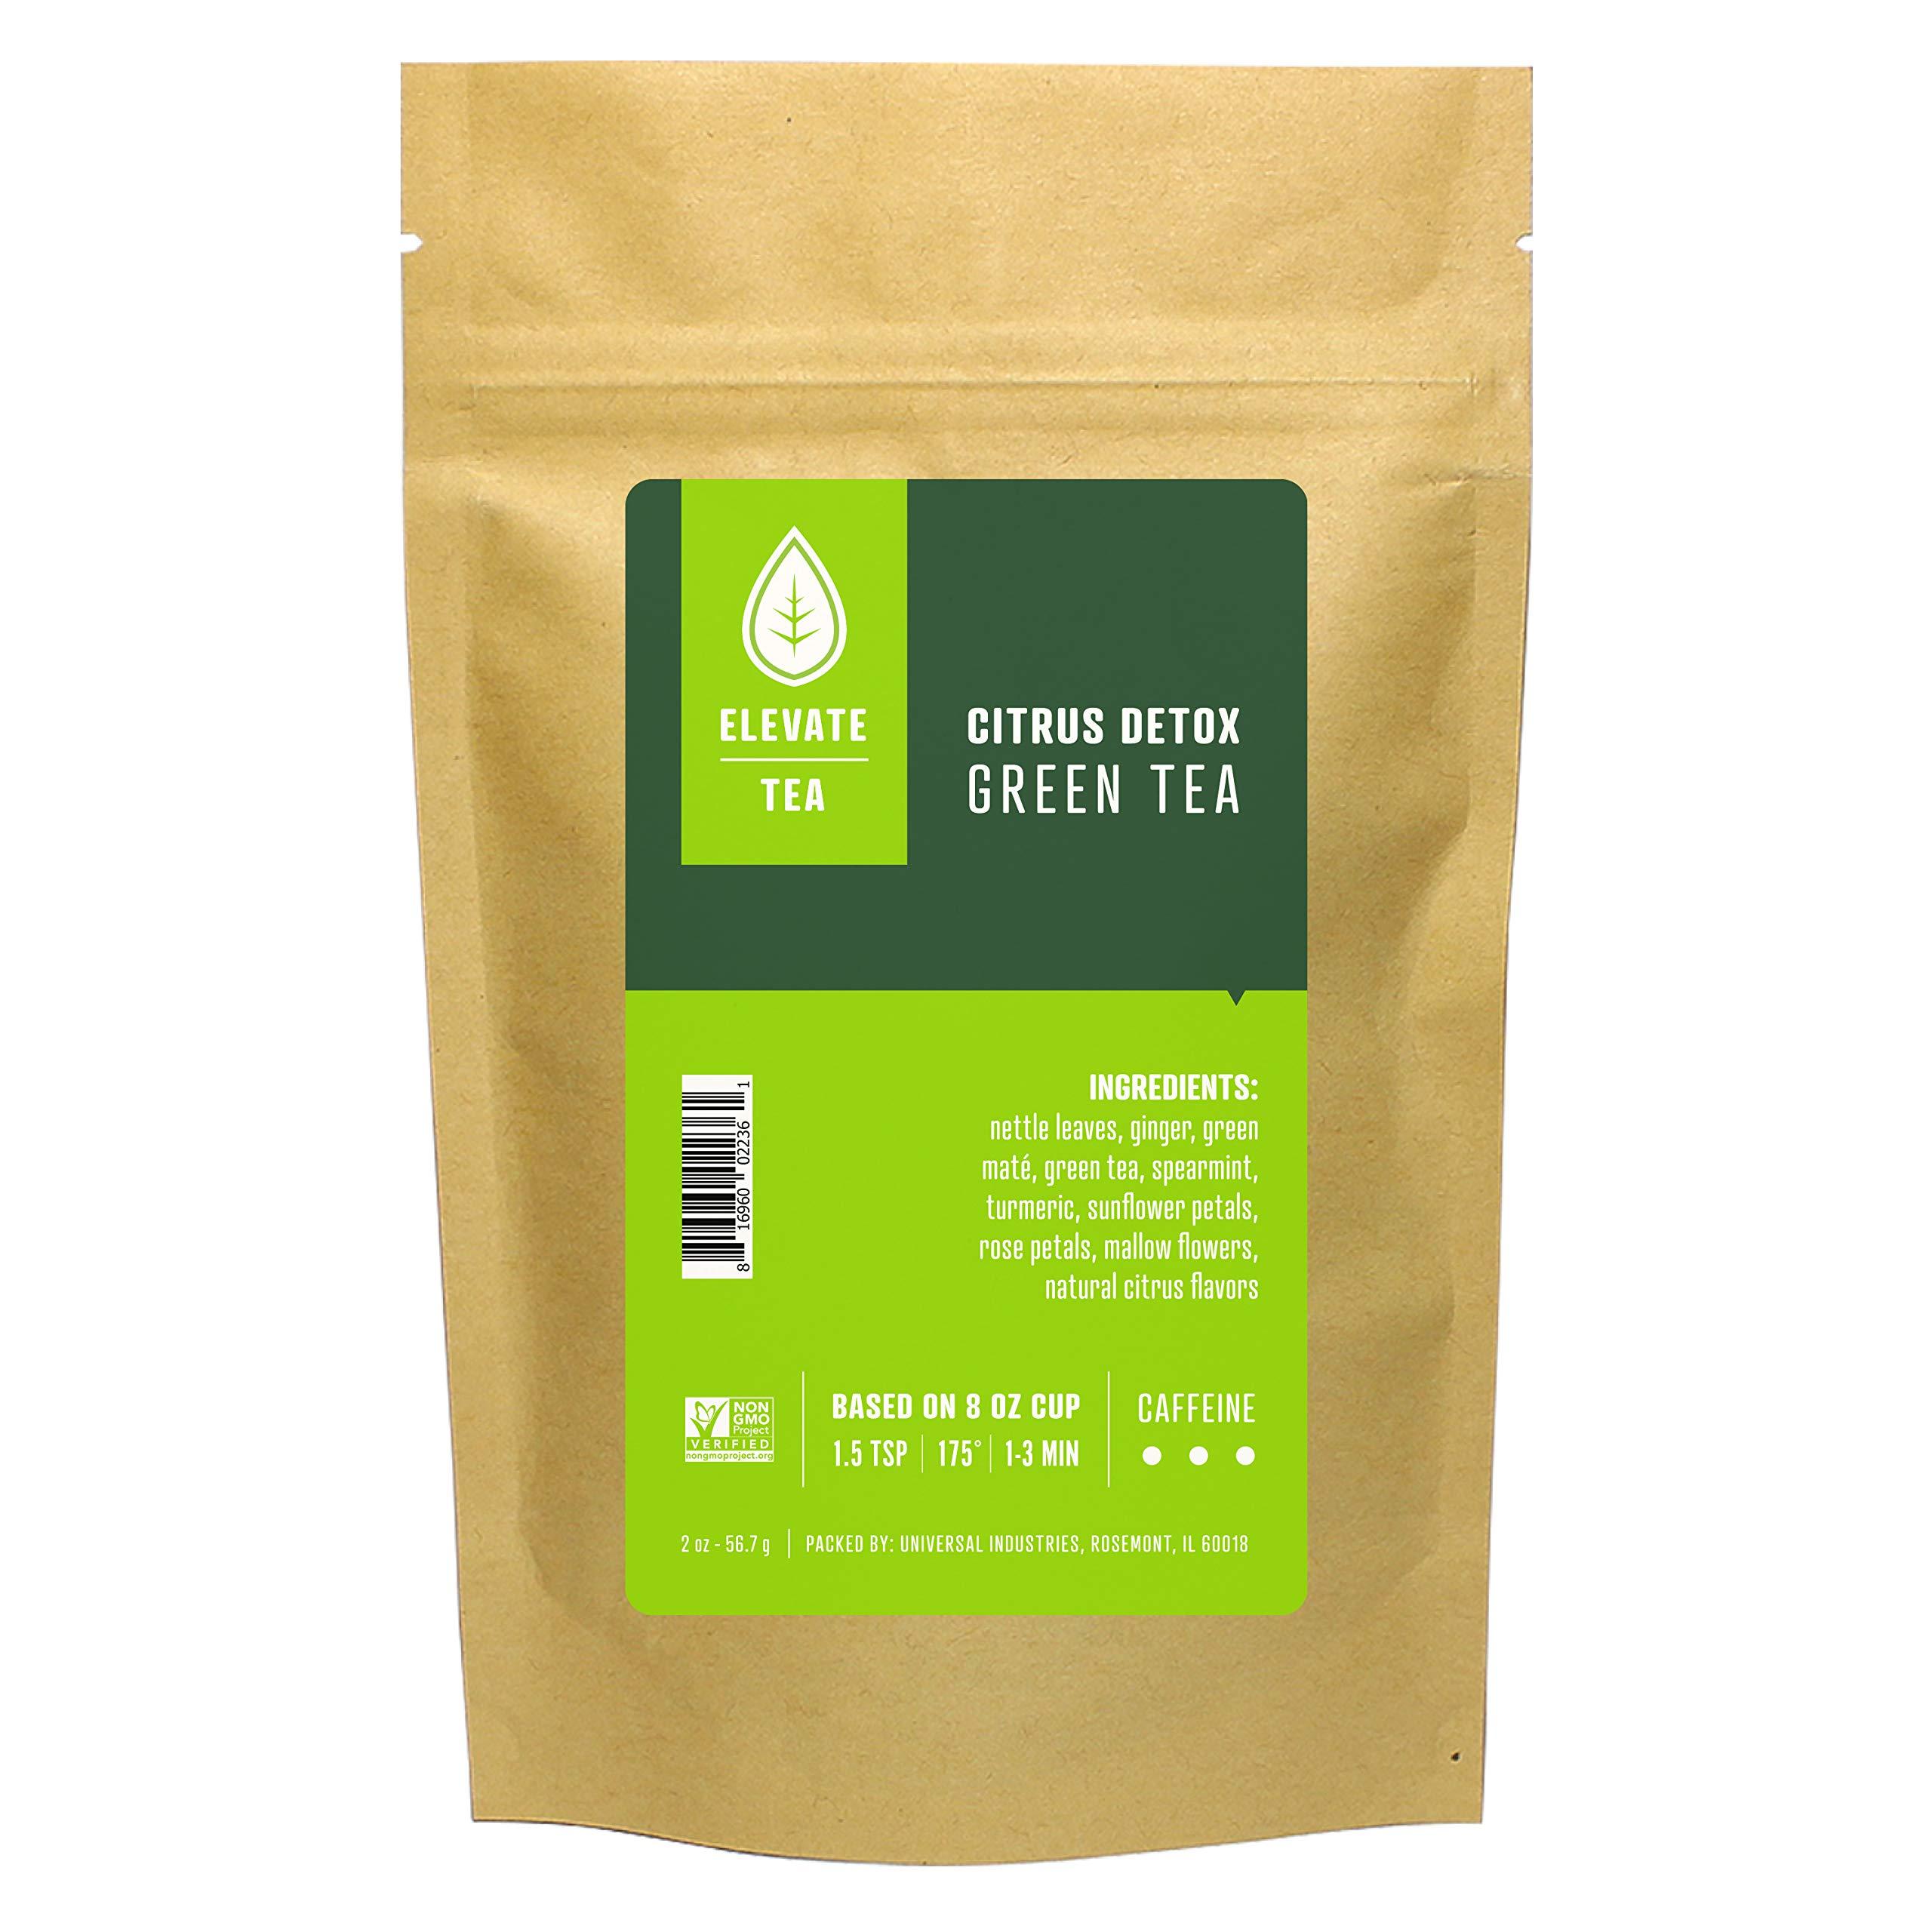 Elevate Tea CITRUS DETOX GREEN TEA, 27 servings, 2 Ounce Pouch, Caffeine Level: Medium, Single Unit